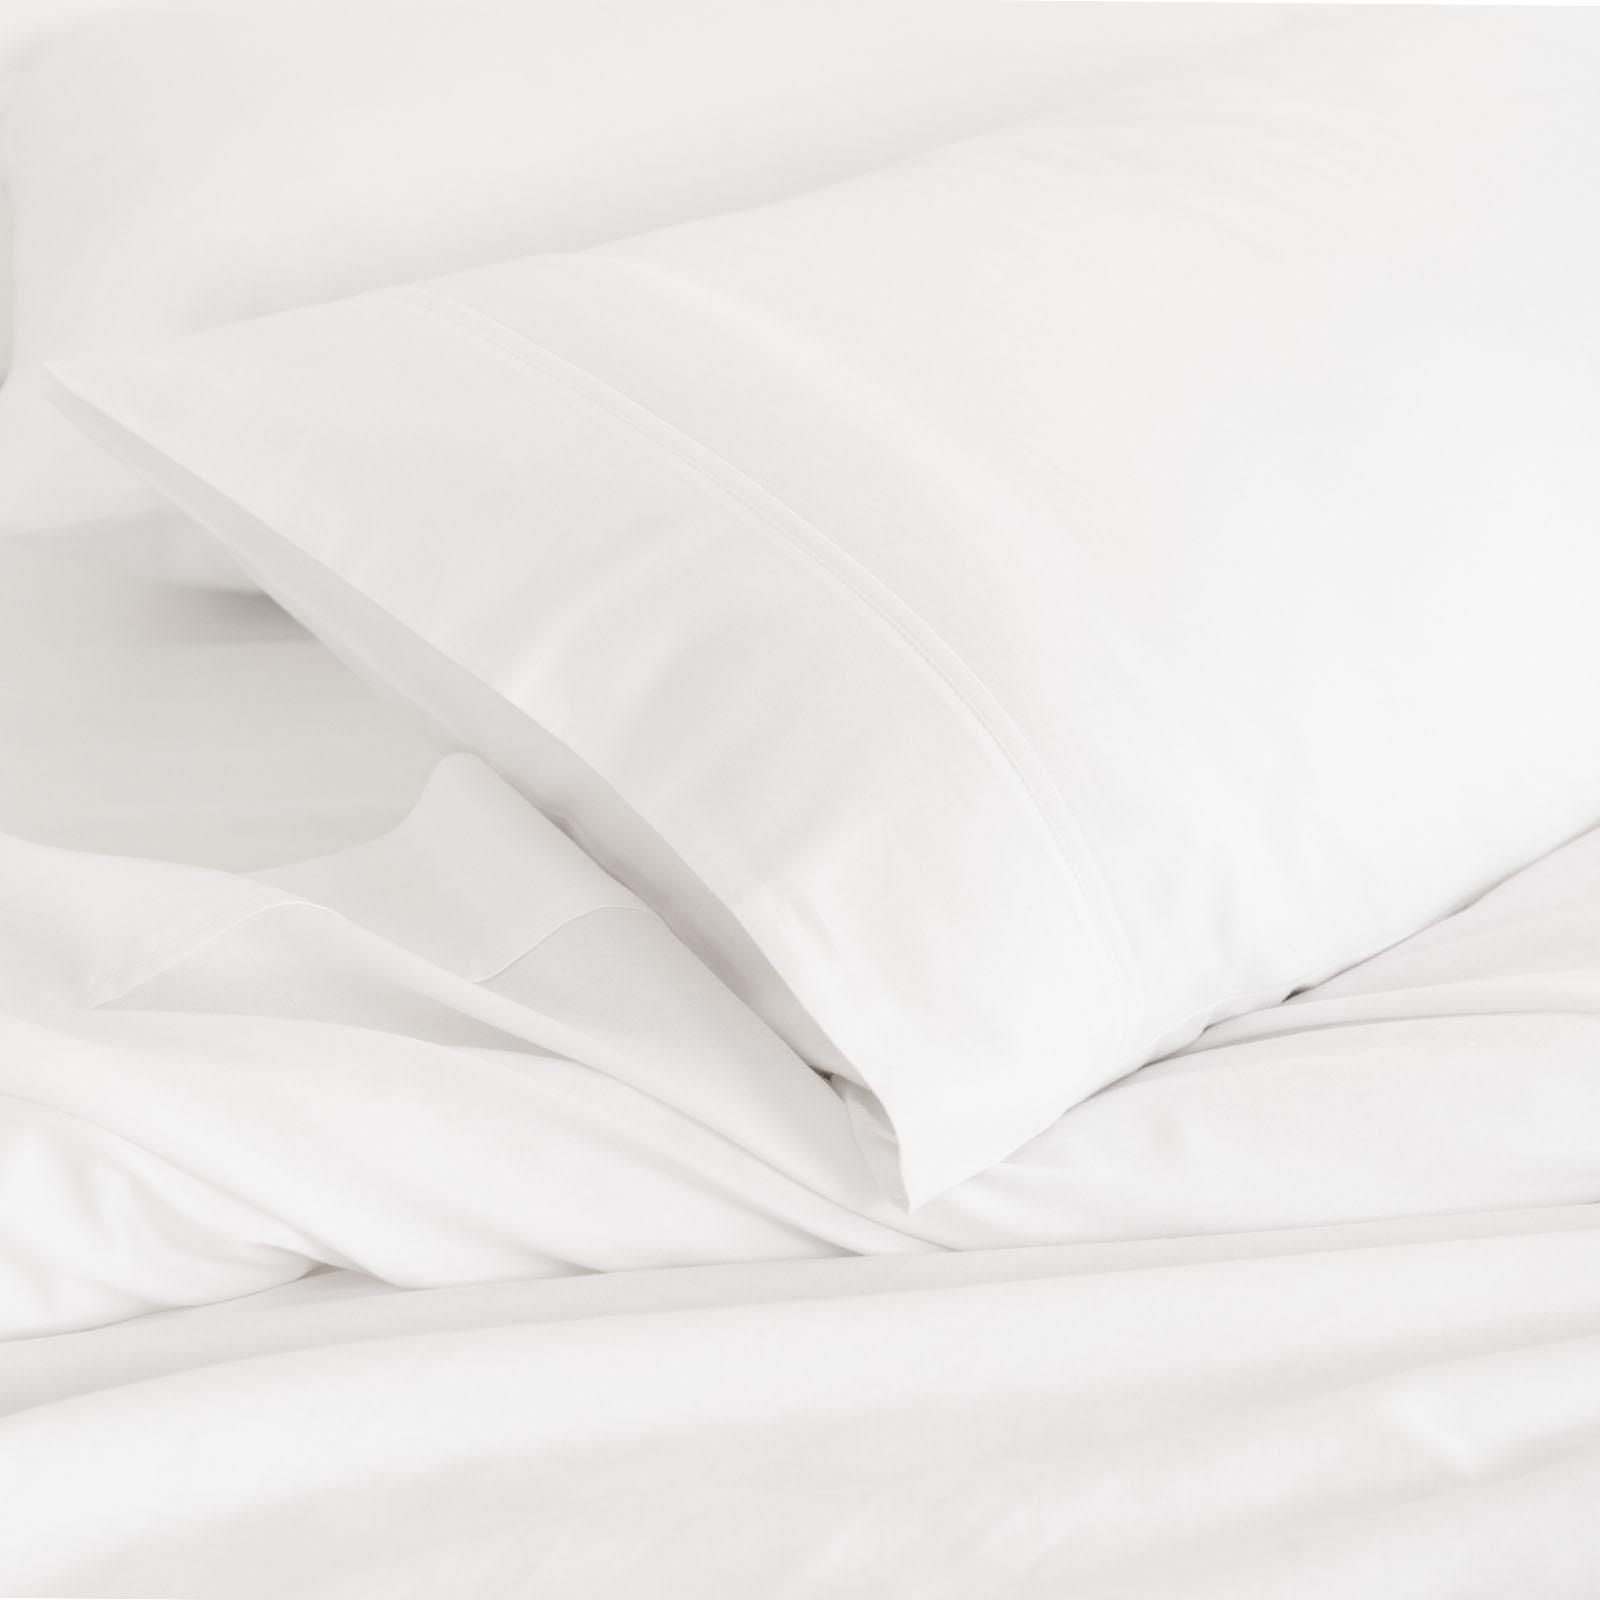 thumbnail 79 - Royal Comfort 1000TC Hotel Grade Bamboo Cotton Sheets Pillowcases Set Ultrasoft